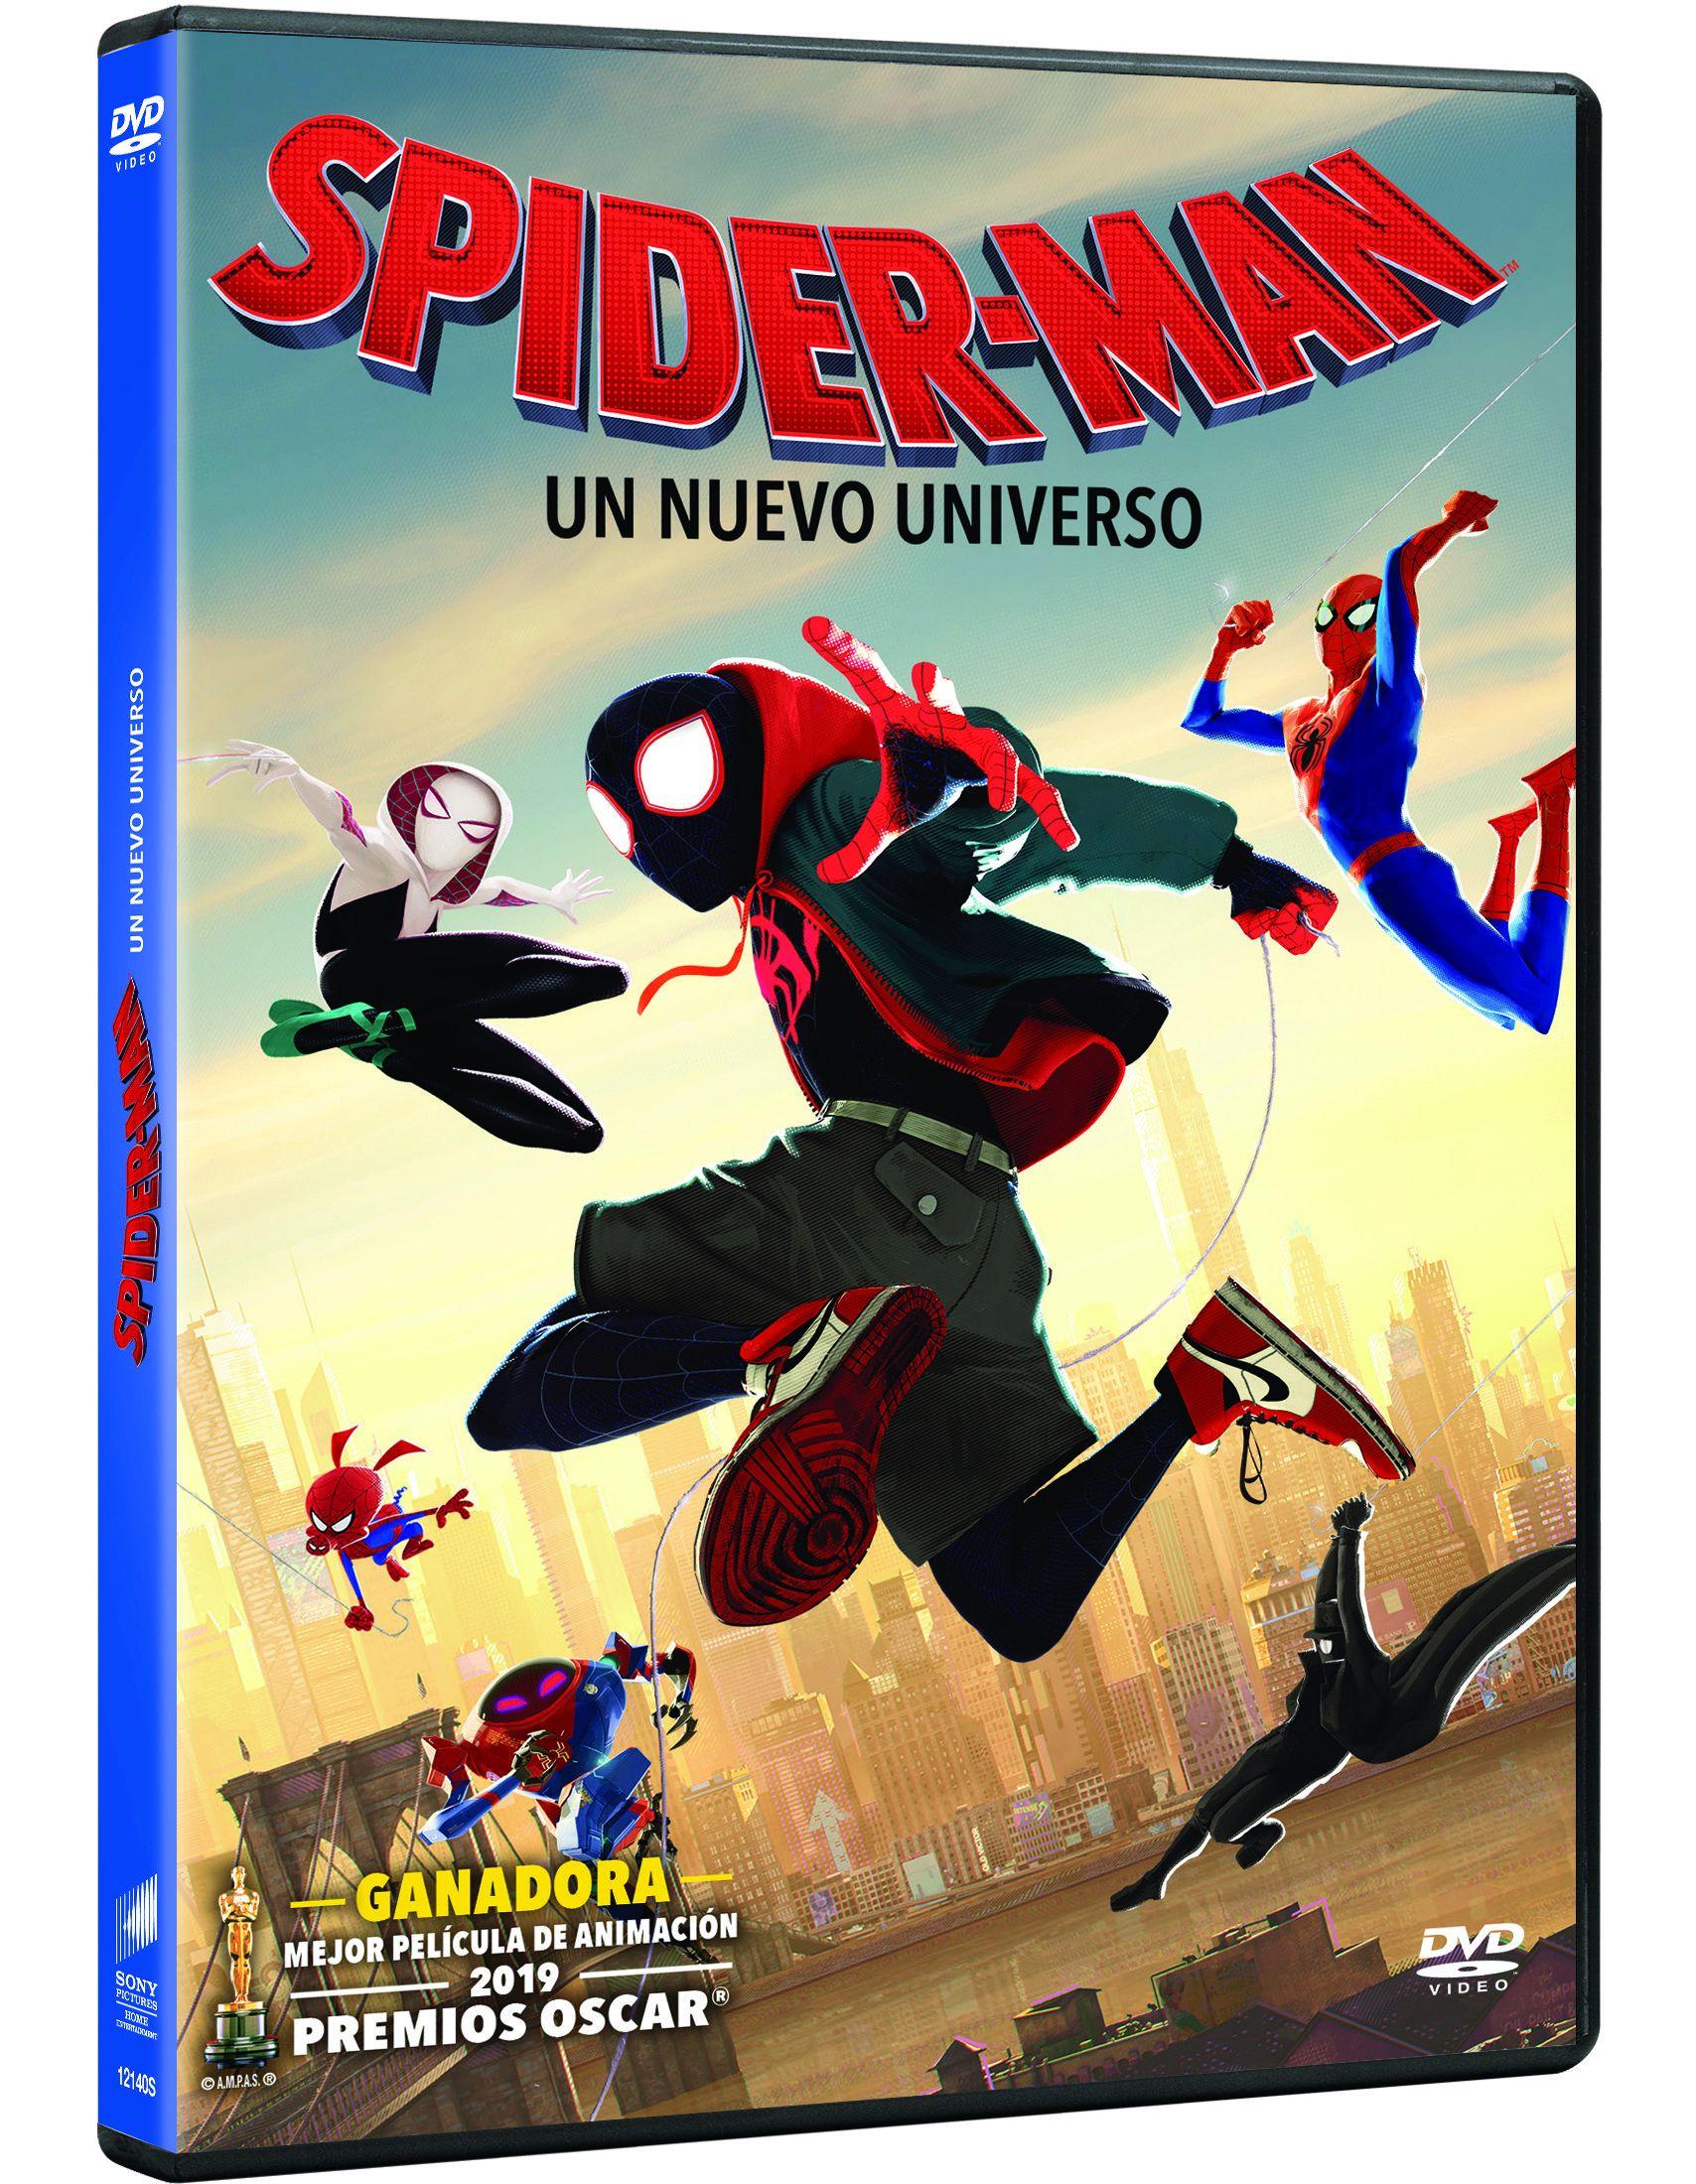 spider-man: un nuevo universo - dvd --8414533121408